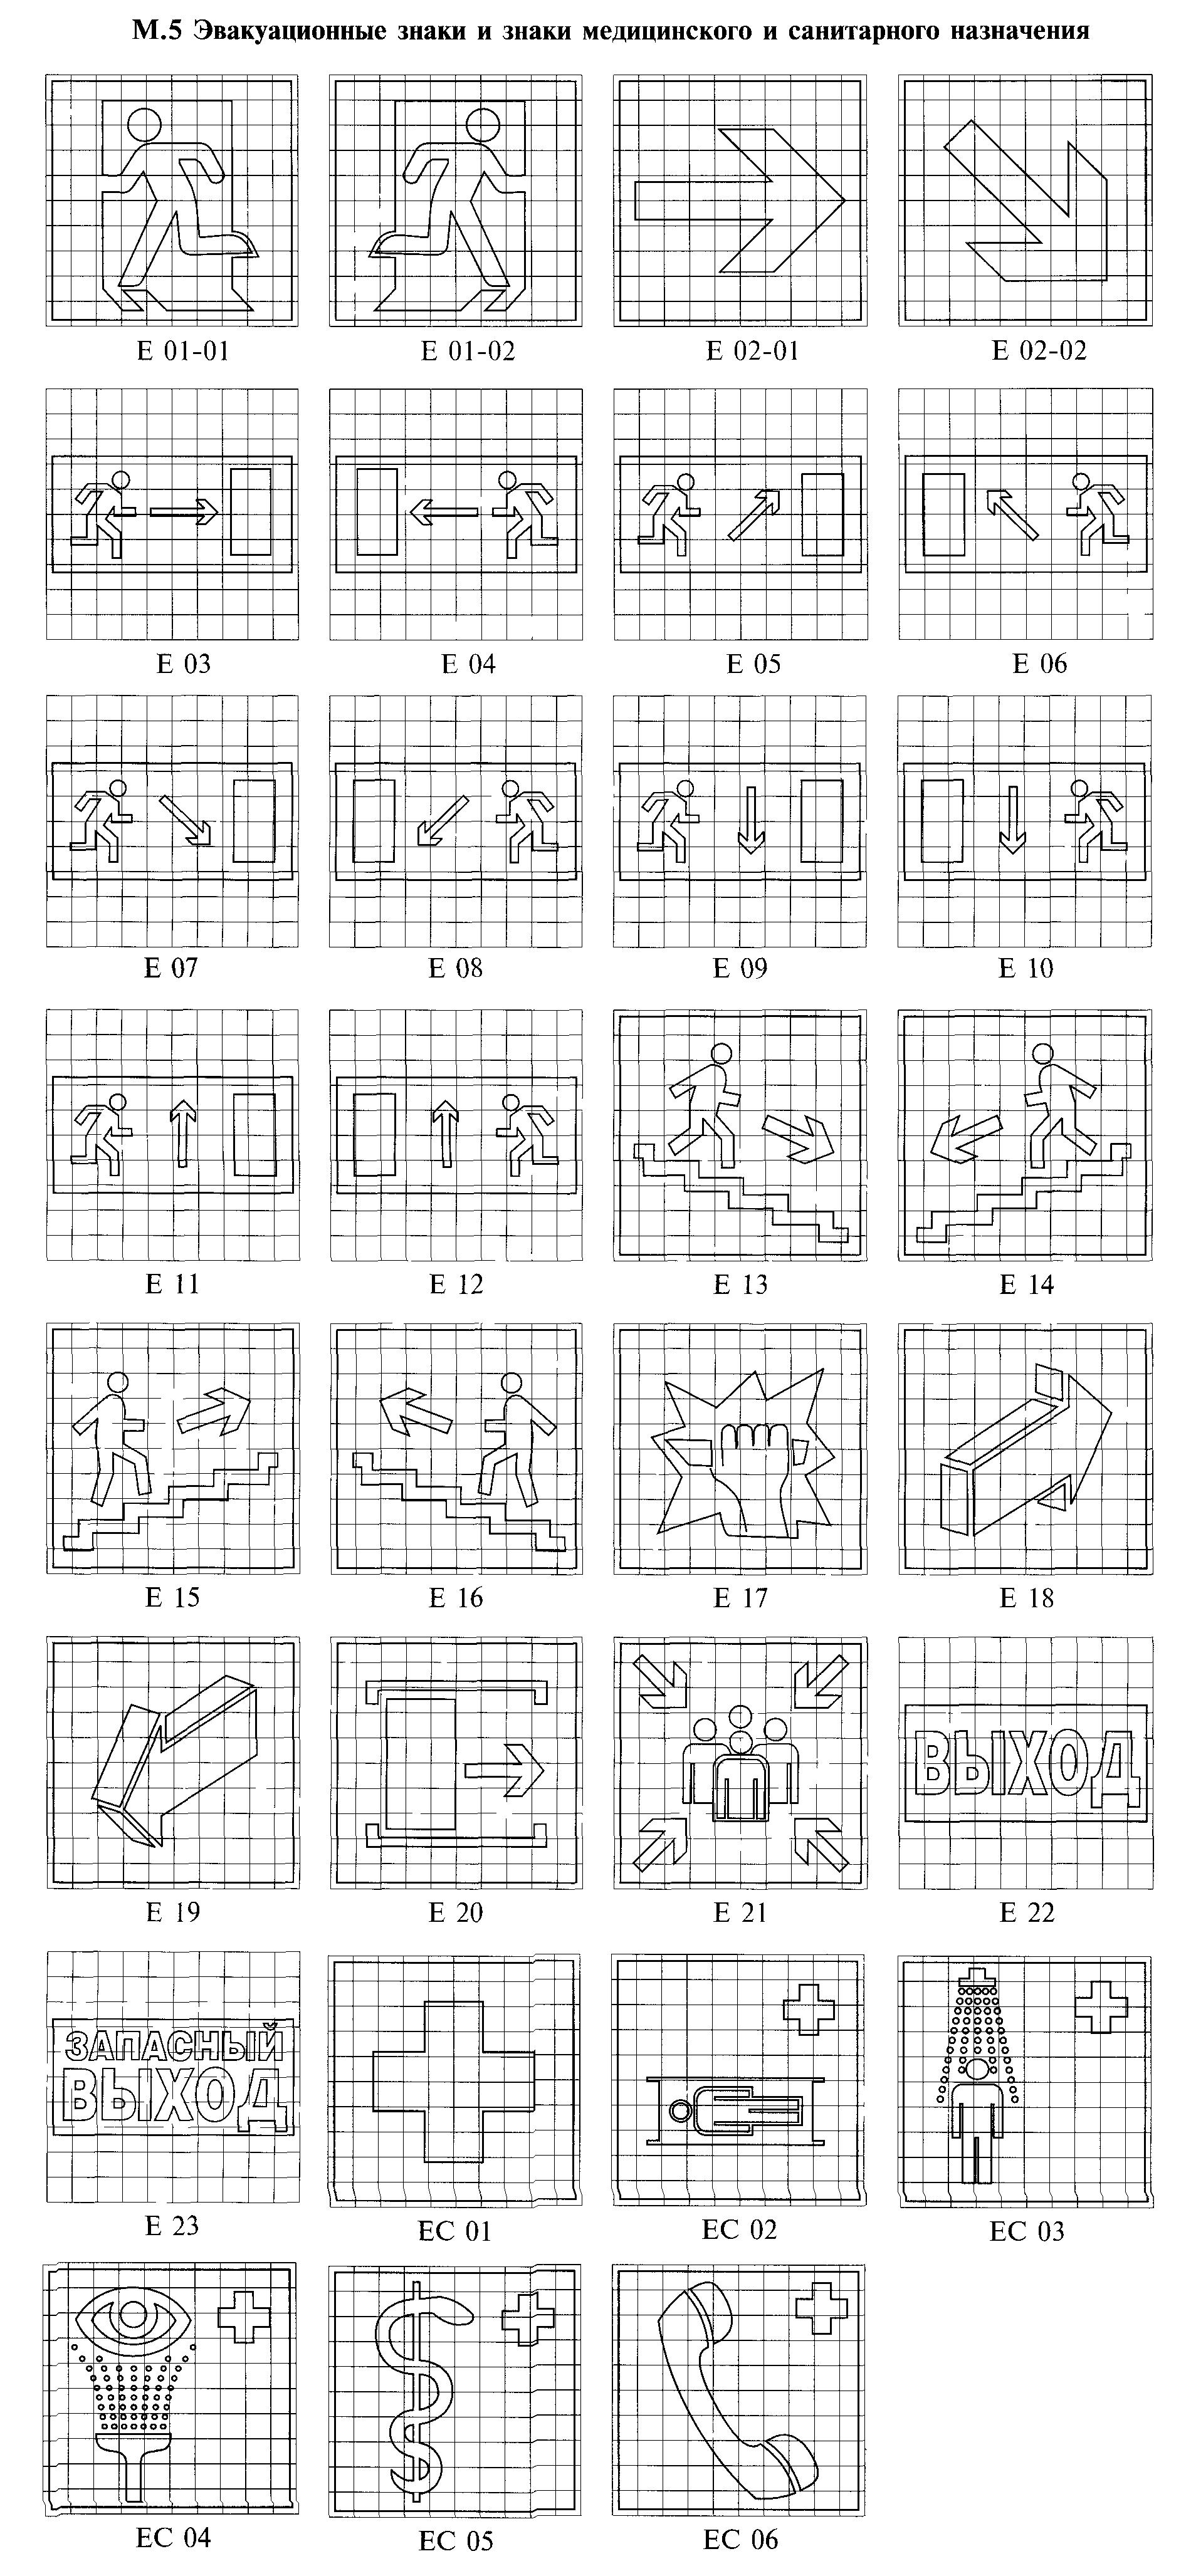 РИСУНОК. М.5. К ГОСТ Р 12.4.026-2001